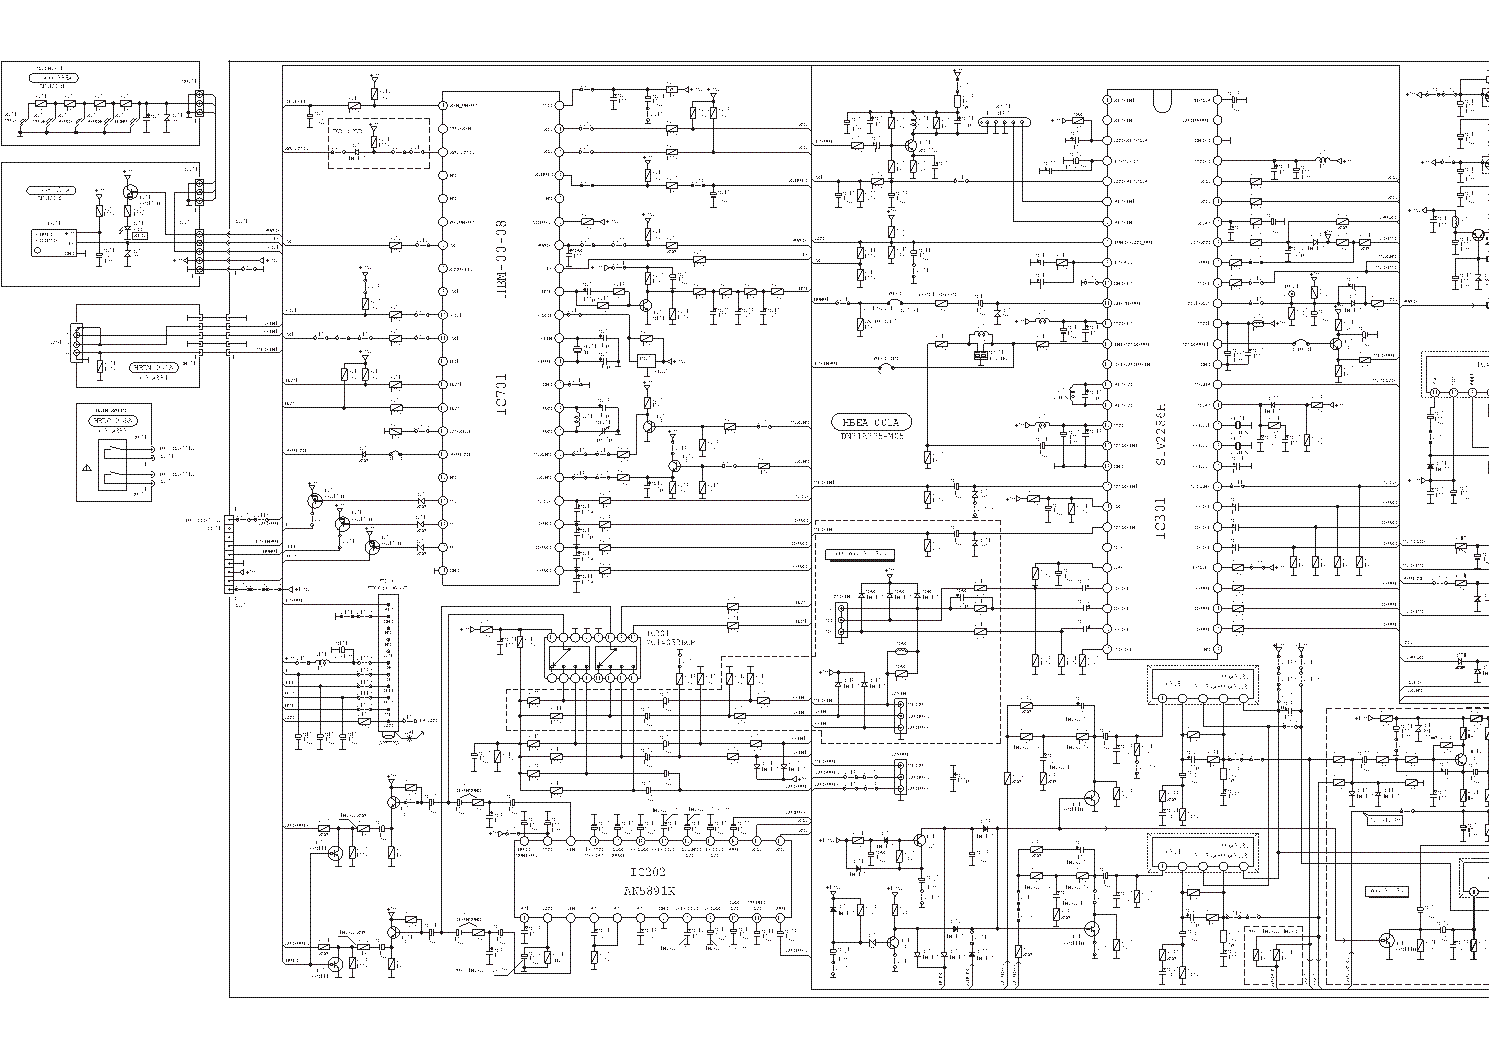 Polytron Tv Schematic Diagram Archive Of Automotive Wiring Mazdaspeed 3 Engine Mx5203ms Chassis Bml Hbea 028b Service Manual Download Rh Elektrotanya Com